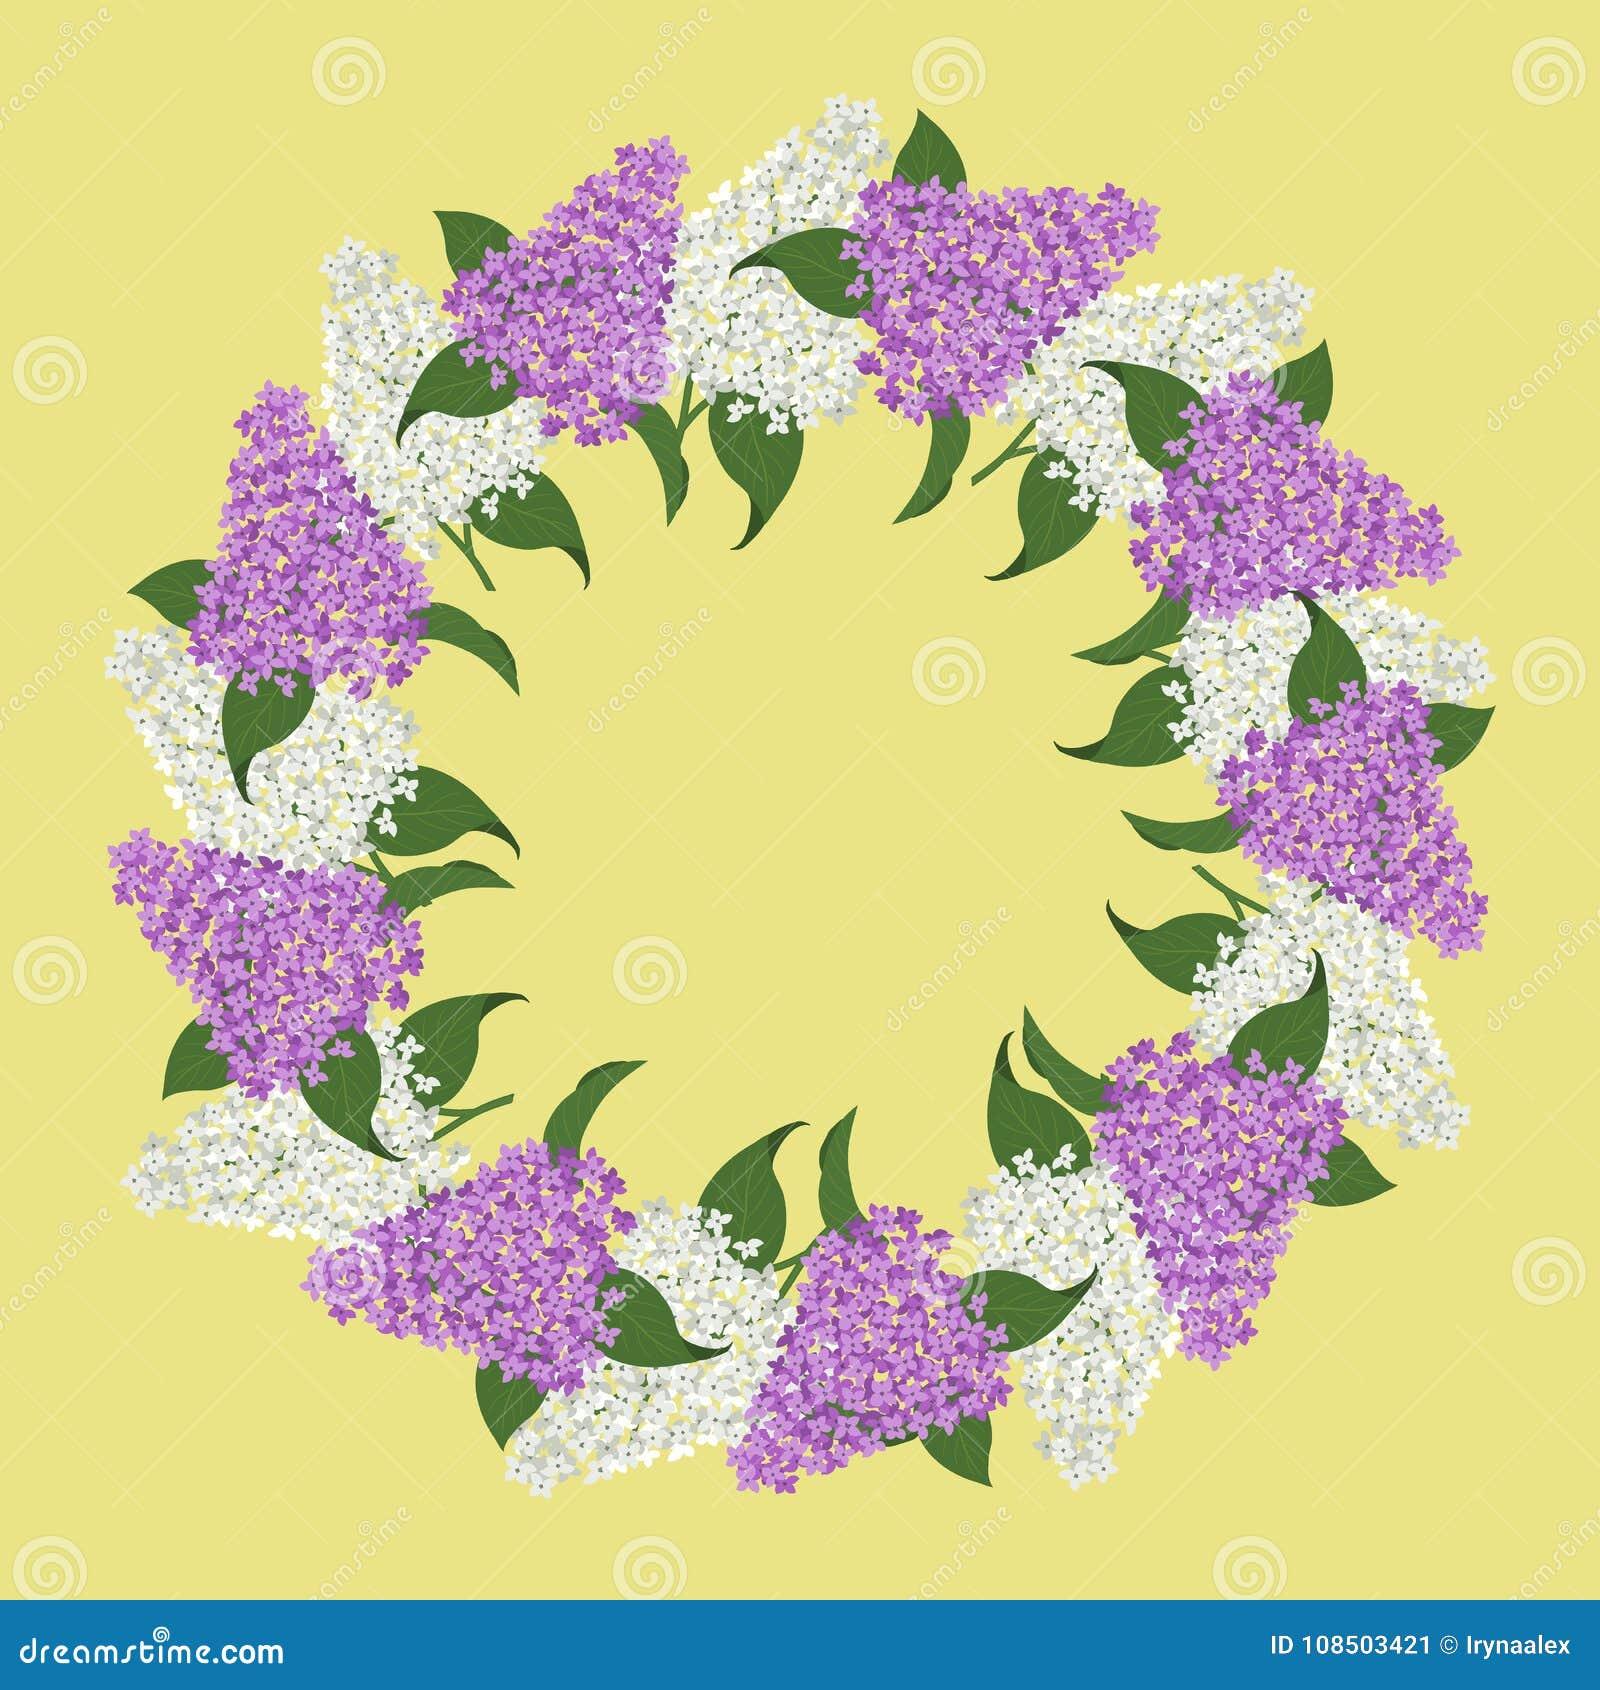 What dreams of lilac White lilac in a dream. Interpretation of dreams 58